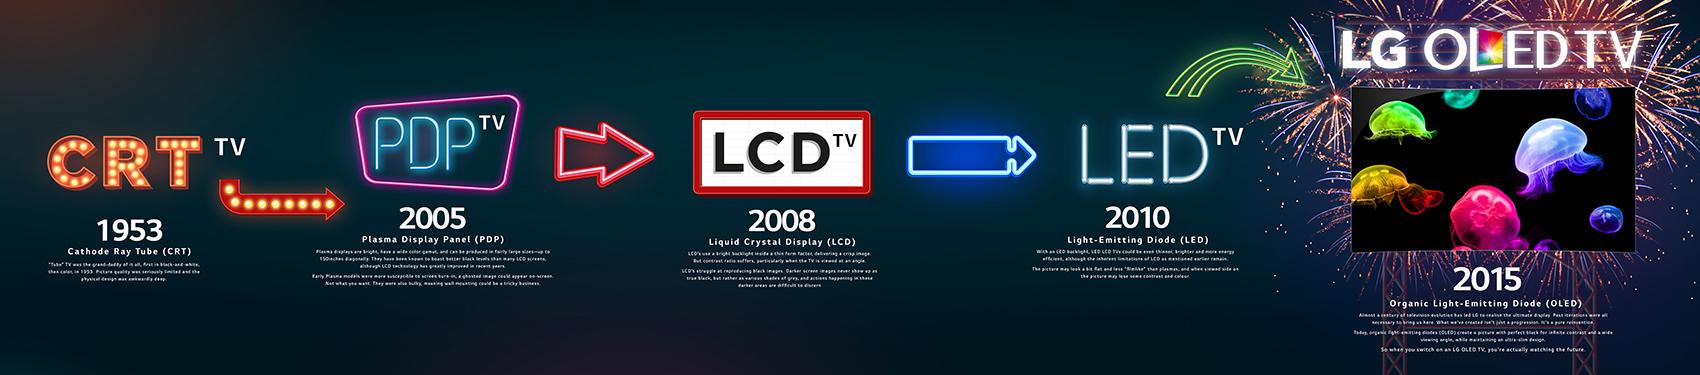 LG OLED timeline